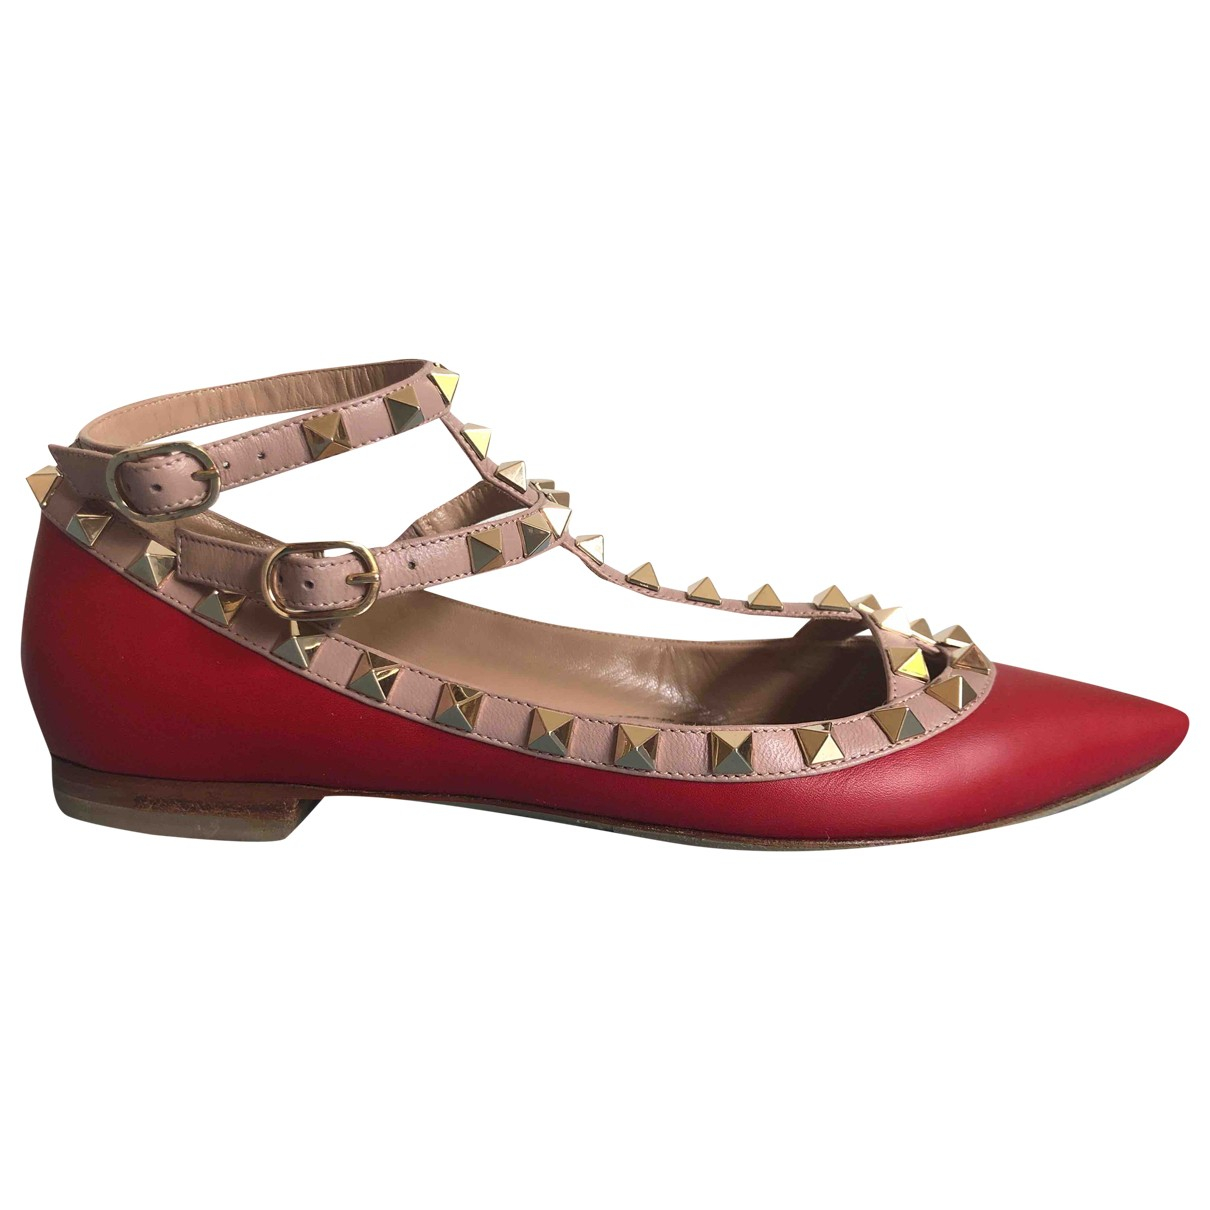 Valentino Garavani Rockstud Red Leather Ballet flats for Women 37 EU